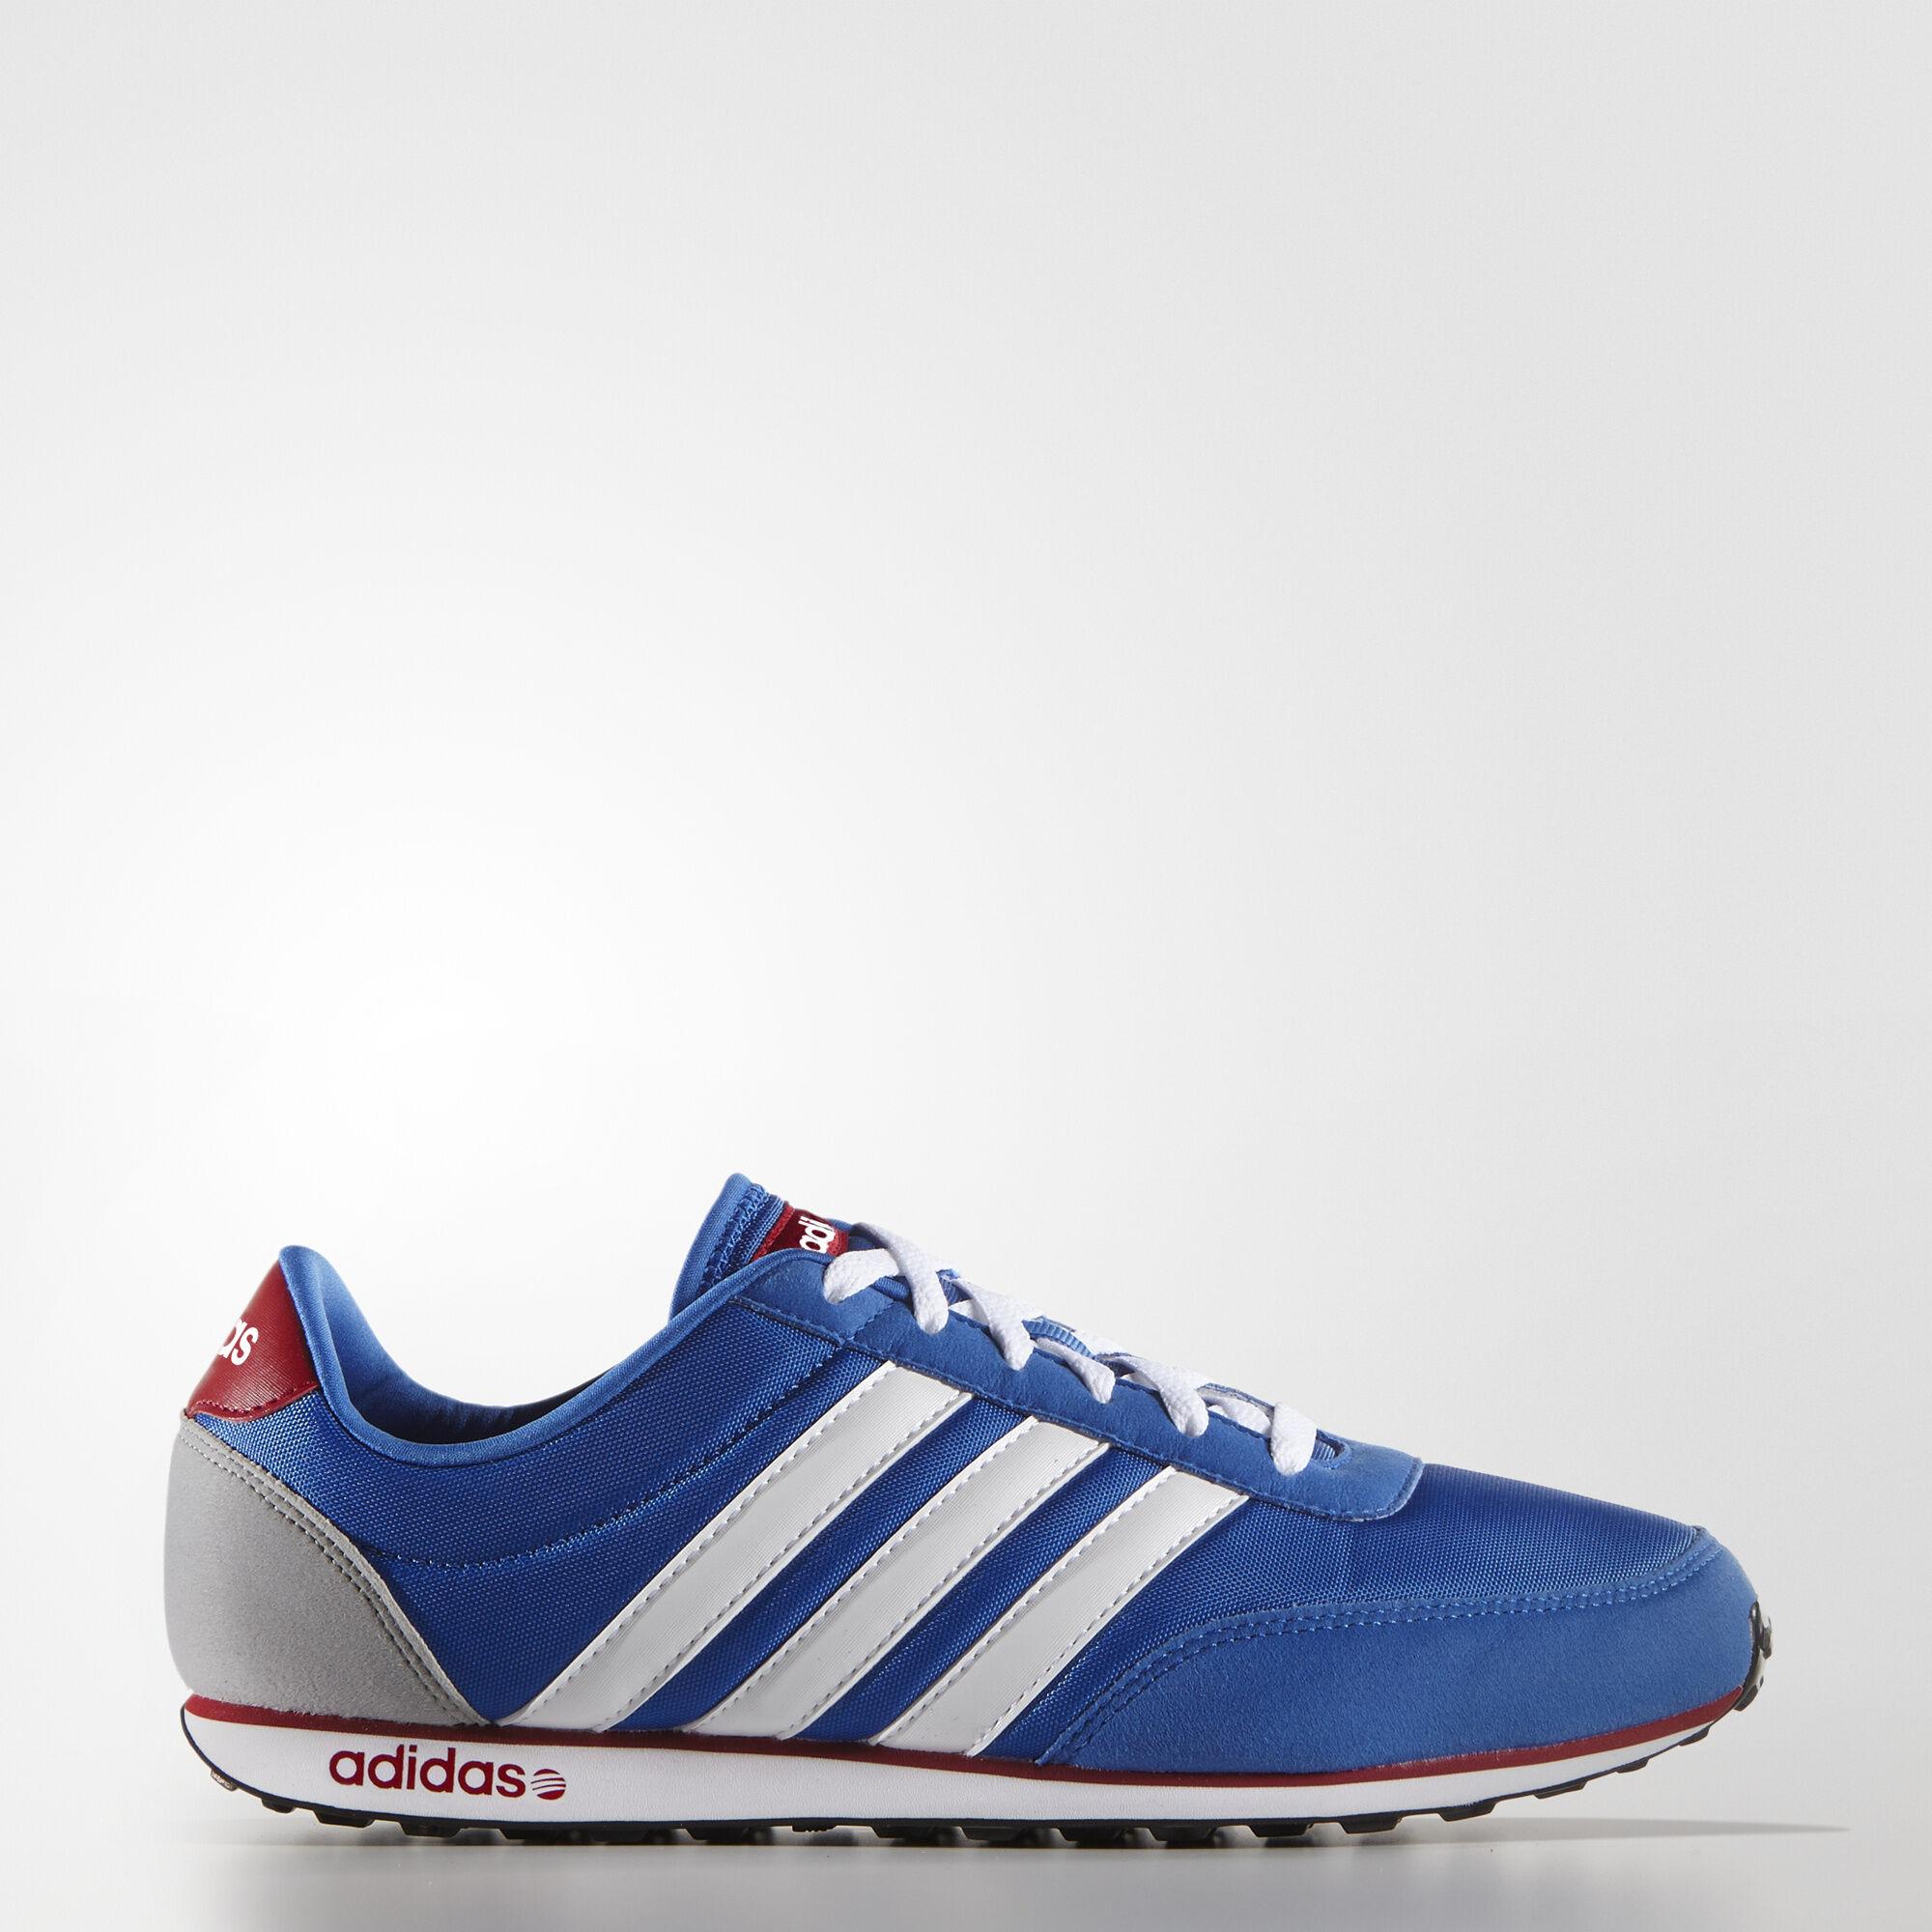 Adidas Neo V